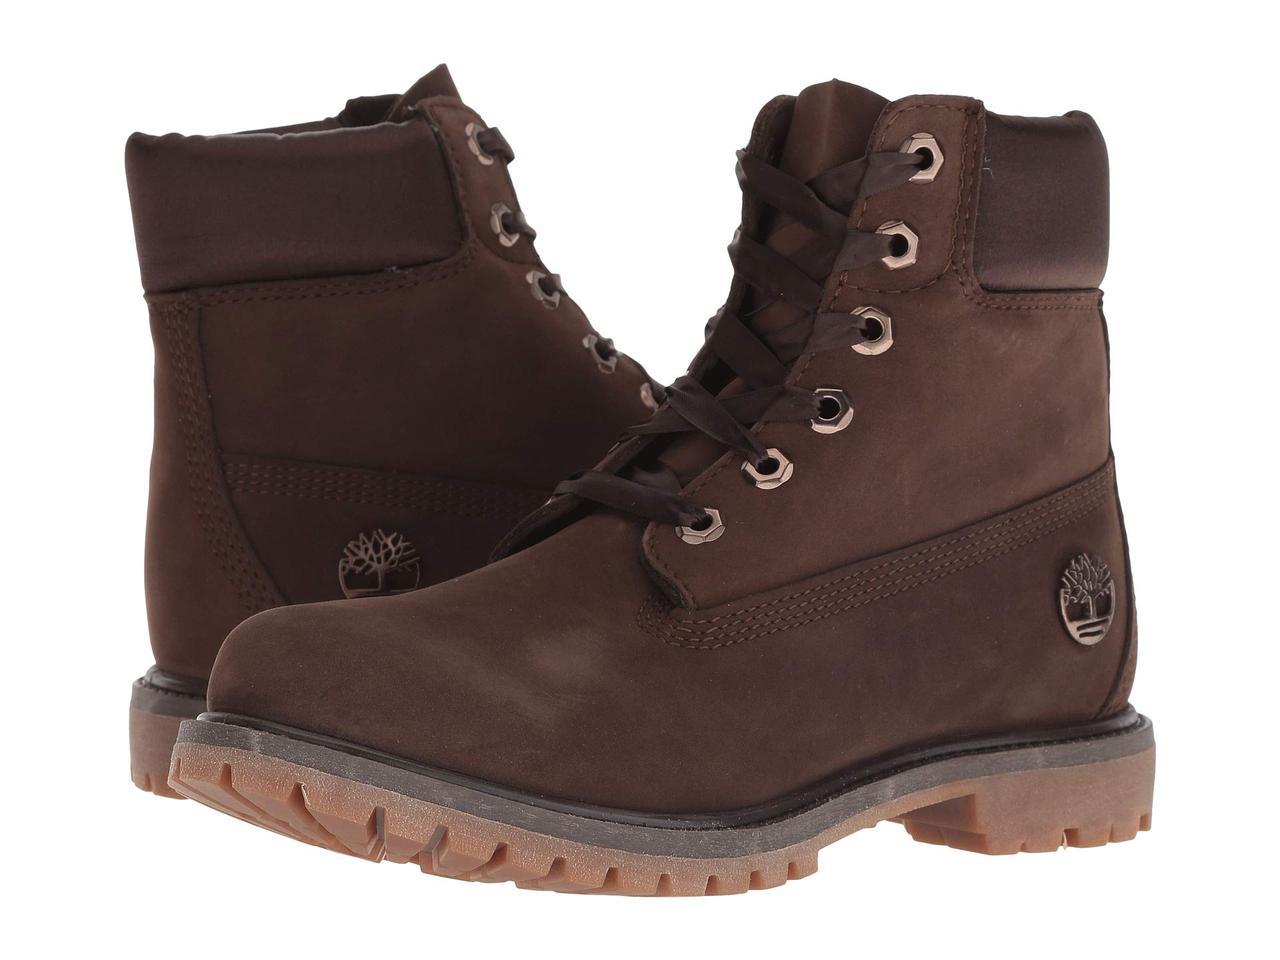 d0b80423042c Ботинки Timberland 6